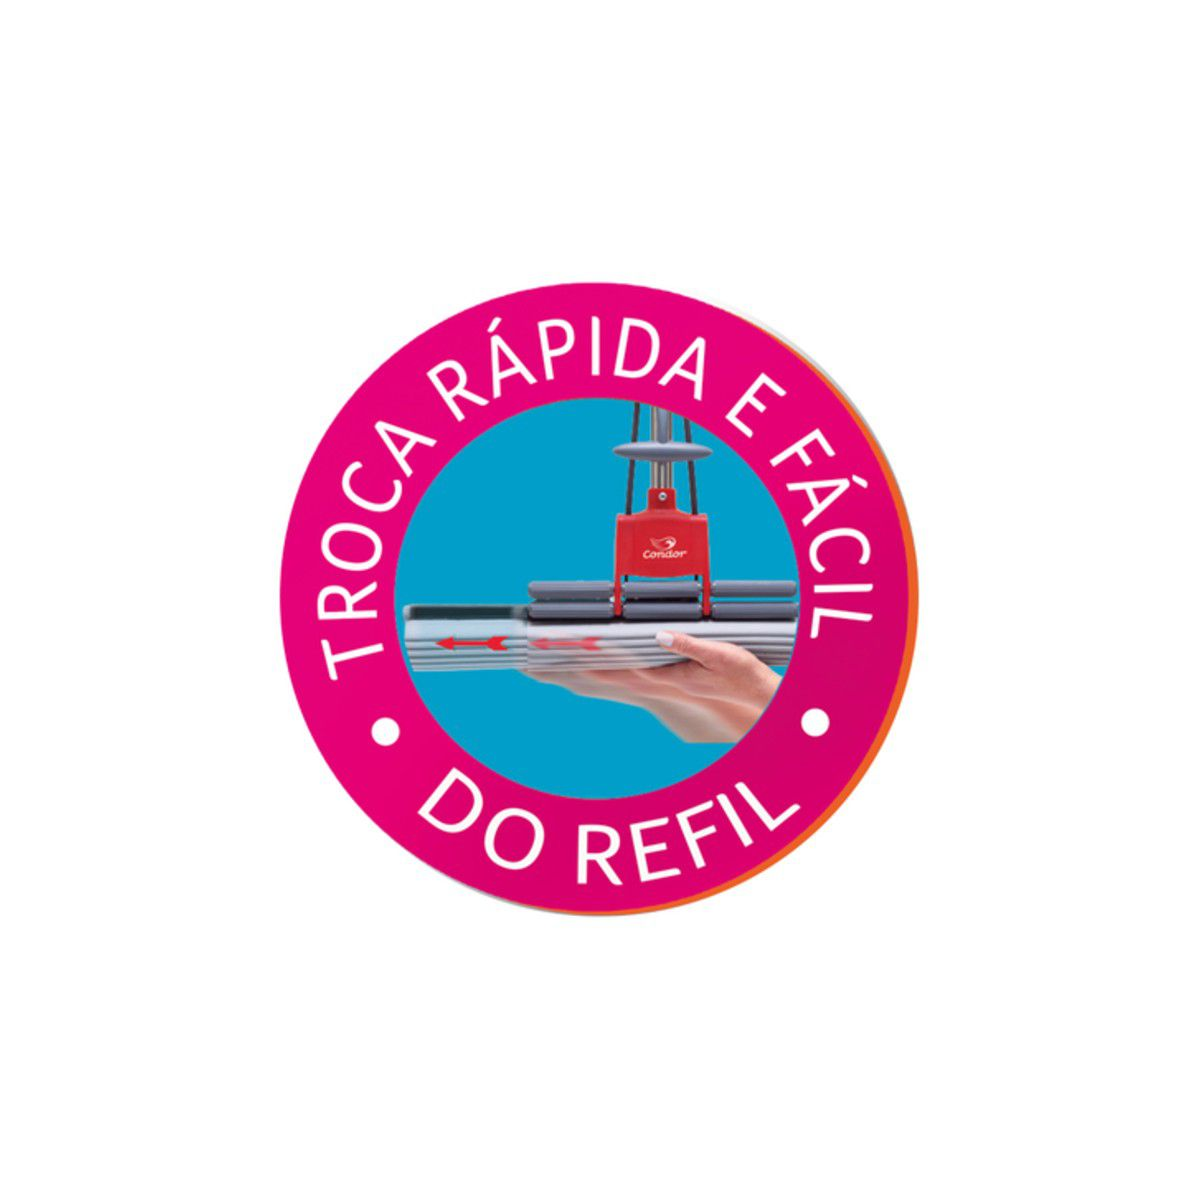 Kit 10 Refil Para Rodo Magico MOP de PVA Condor